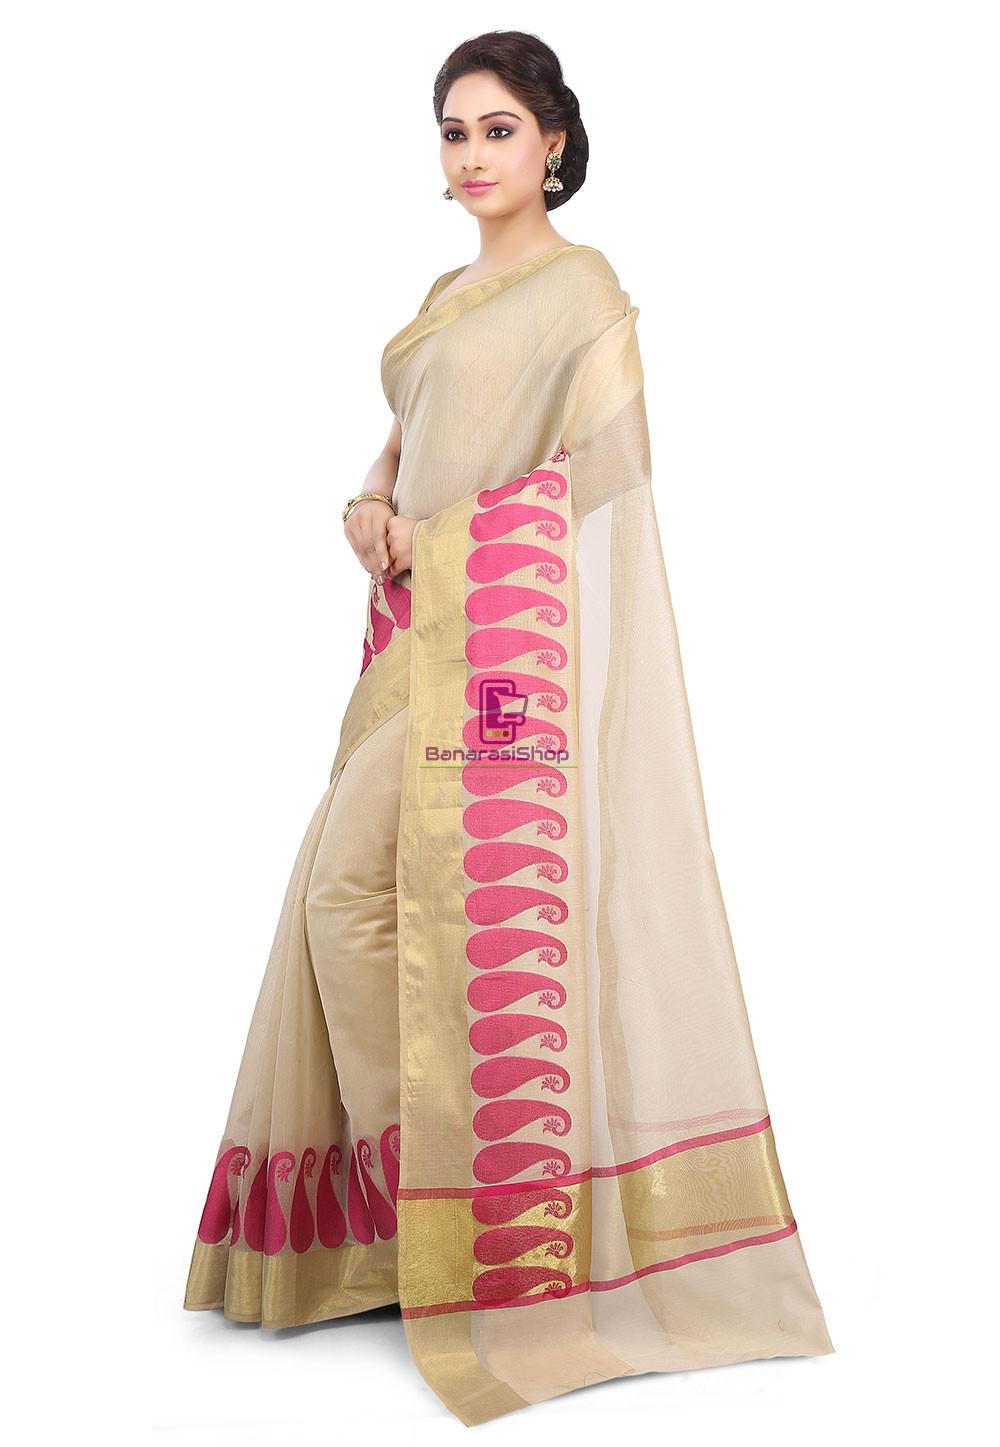 Woven Banarasi Chanderi Cotton Saree in Beige 5